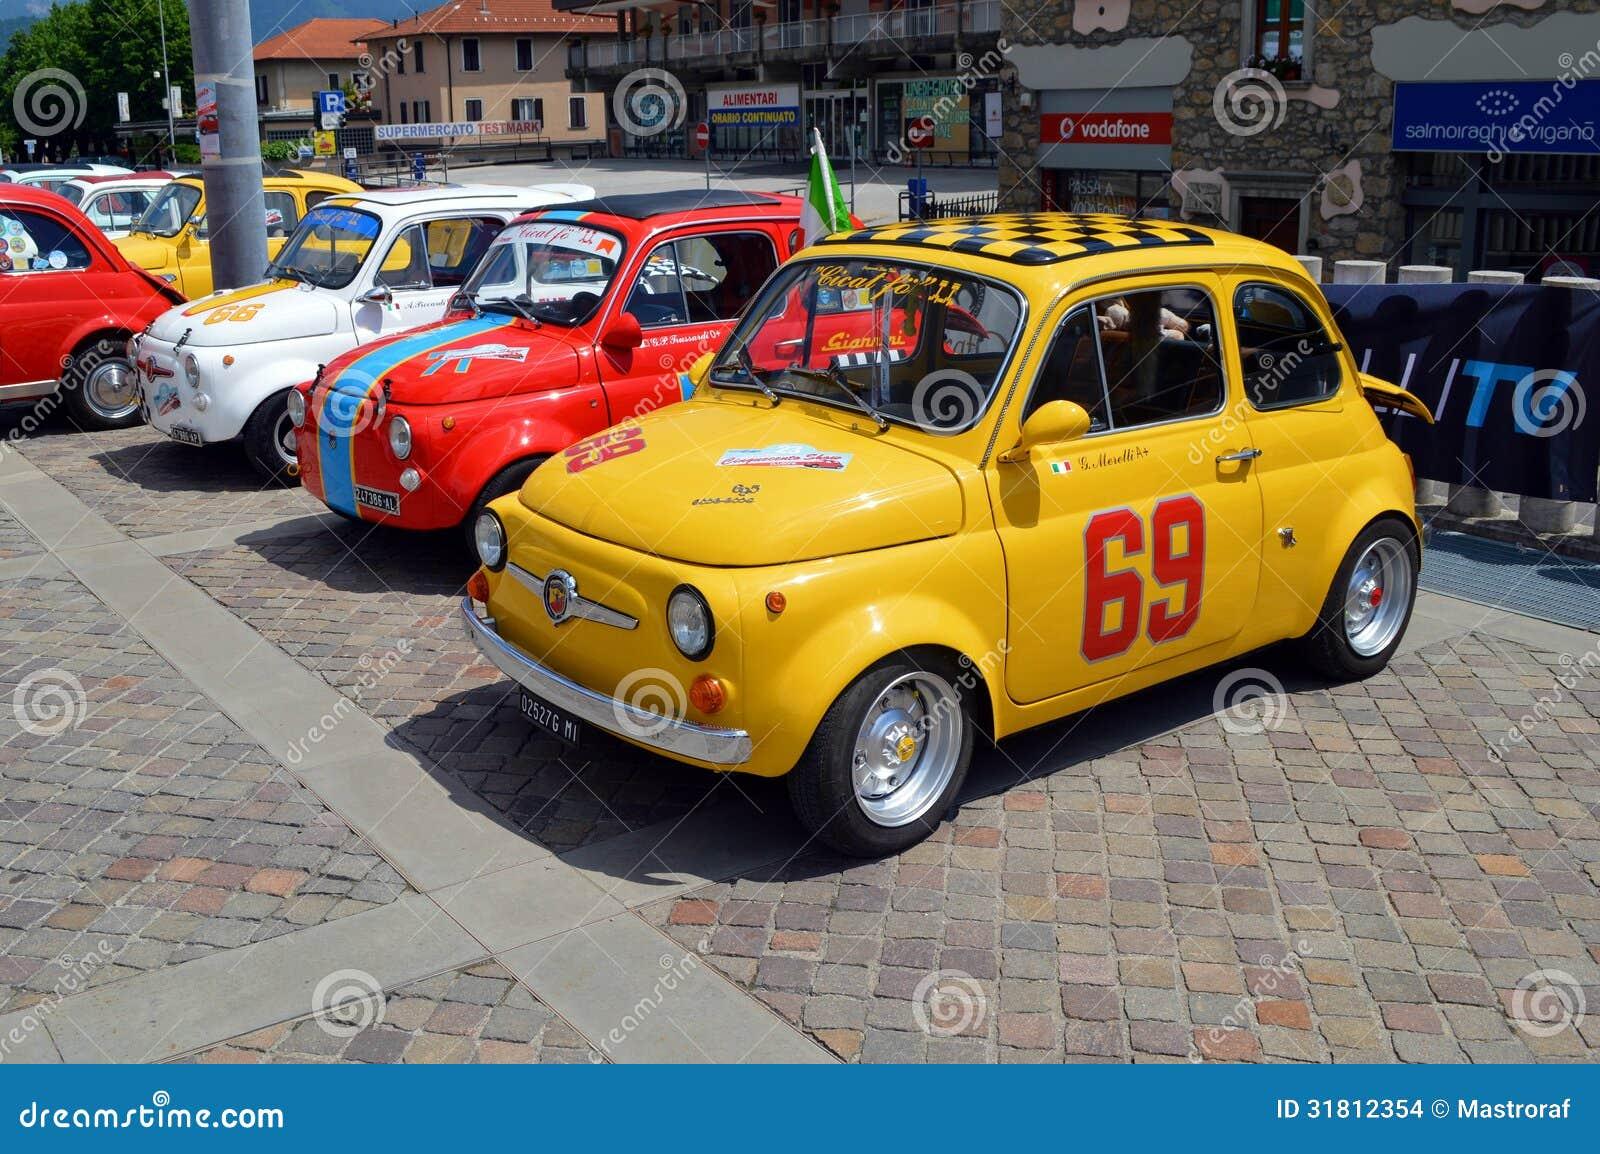 FIAT 500 Abarth editorial stock image. Image of fast - 31812354 Fiat Wide on fiat croma, fiat convertible, fiat linea, fiat models, fiat 126p, fiat 500e, fiat 500c, fiat palio, fiat ducato, fiat hatchback, fiat cinquecento, fiat doblo, fiat seicento,